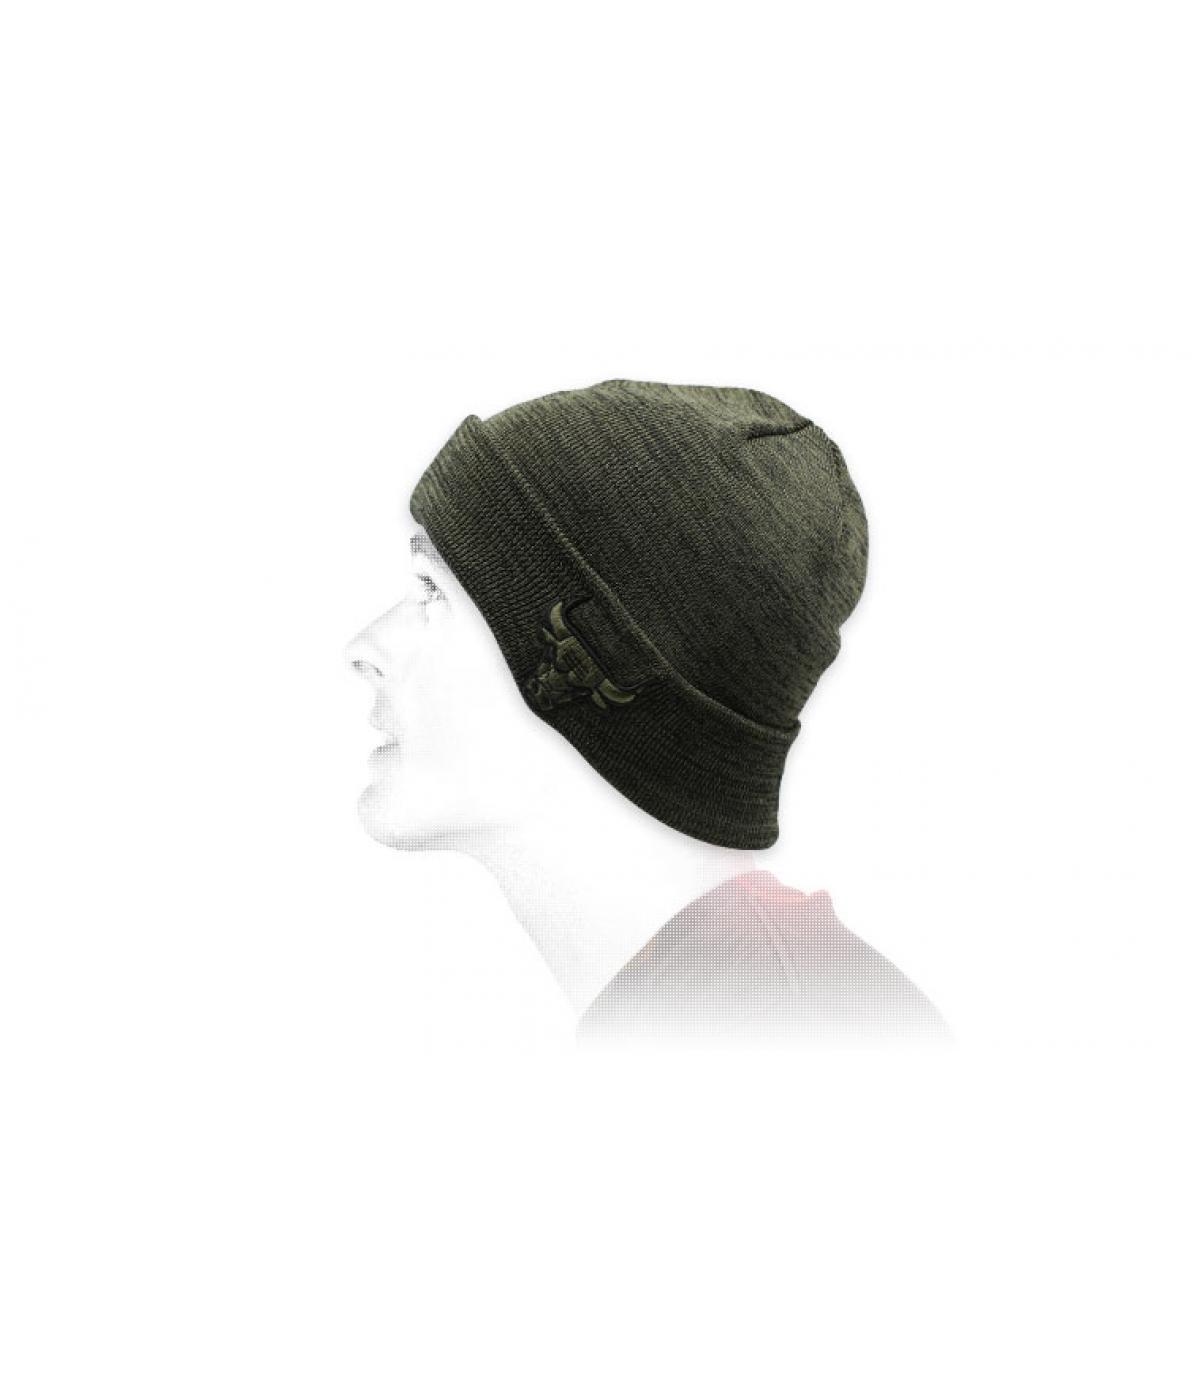 berretto verde oliva